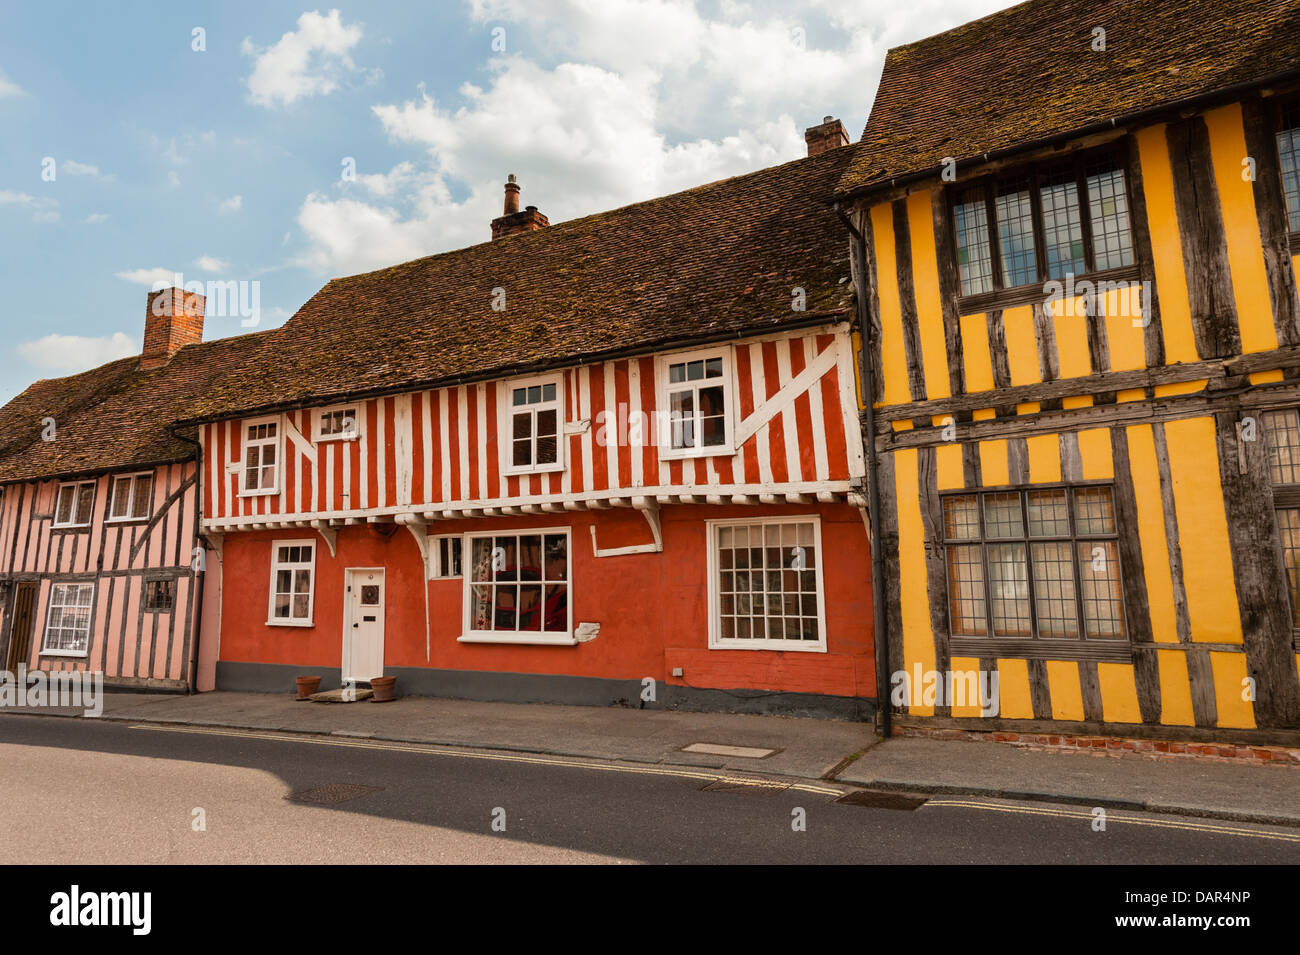 Water Street, Lavenham - Stock Image